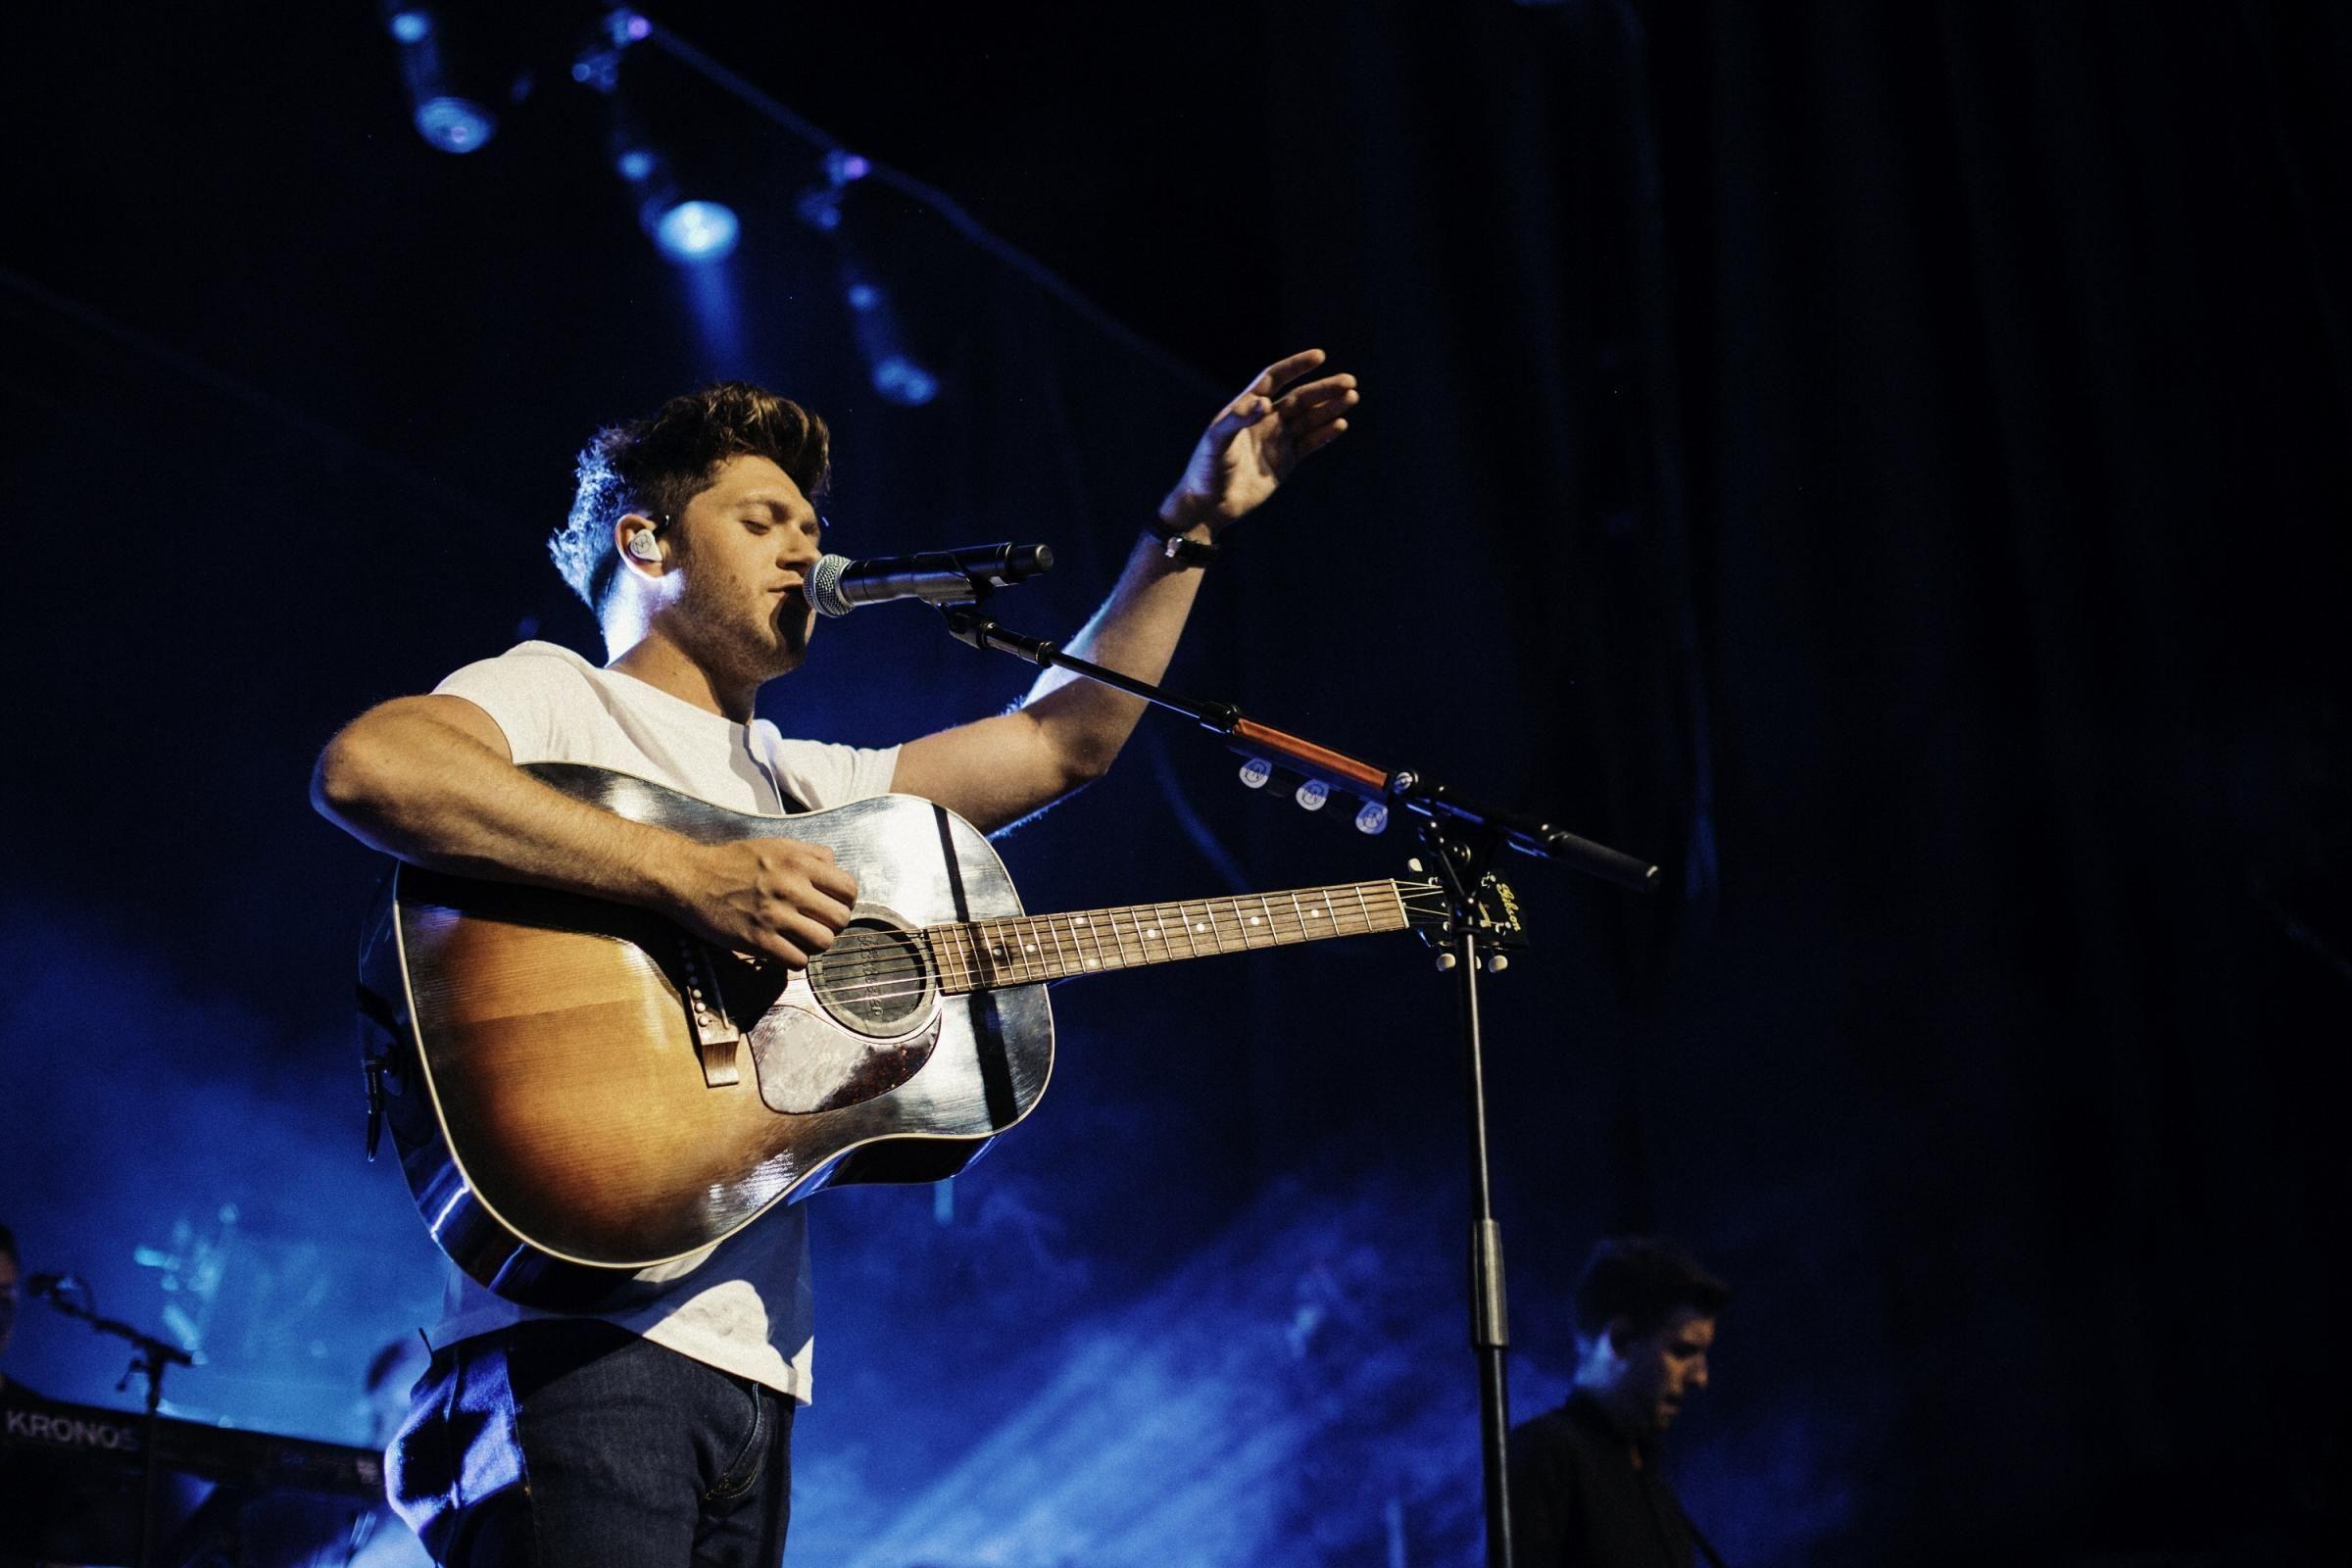 Tinley Park Jul 26 Niall Horan Flicker World Tour 2018 Tinley Park Niall Horan Irish Singers Brixton Academy